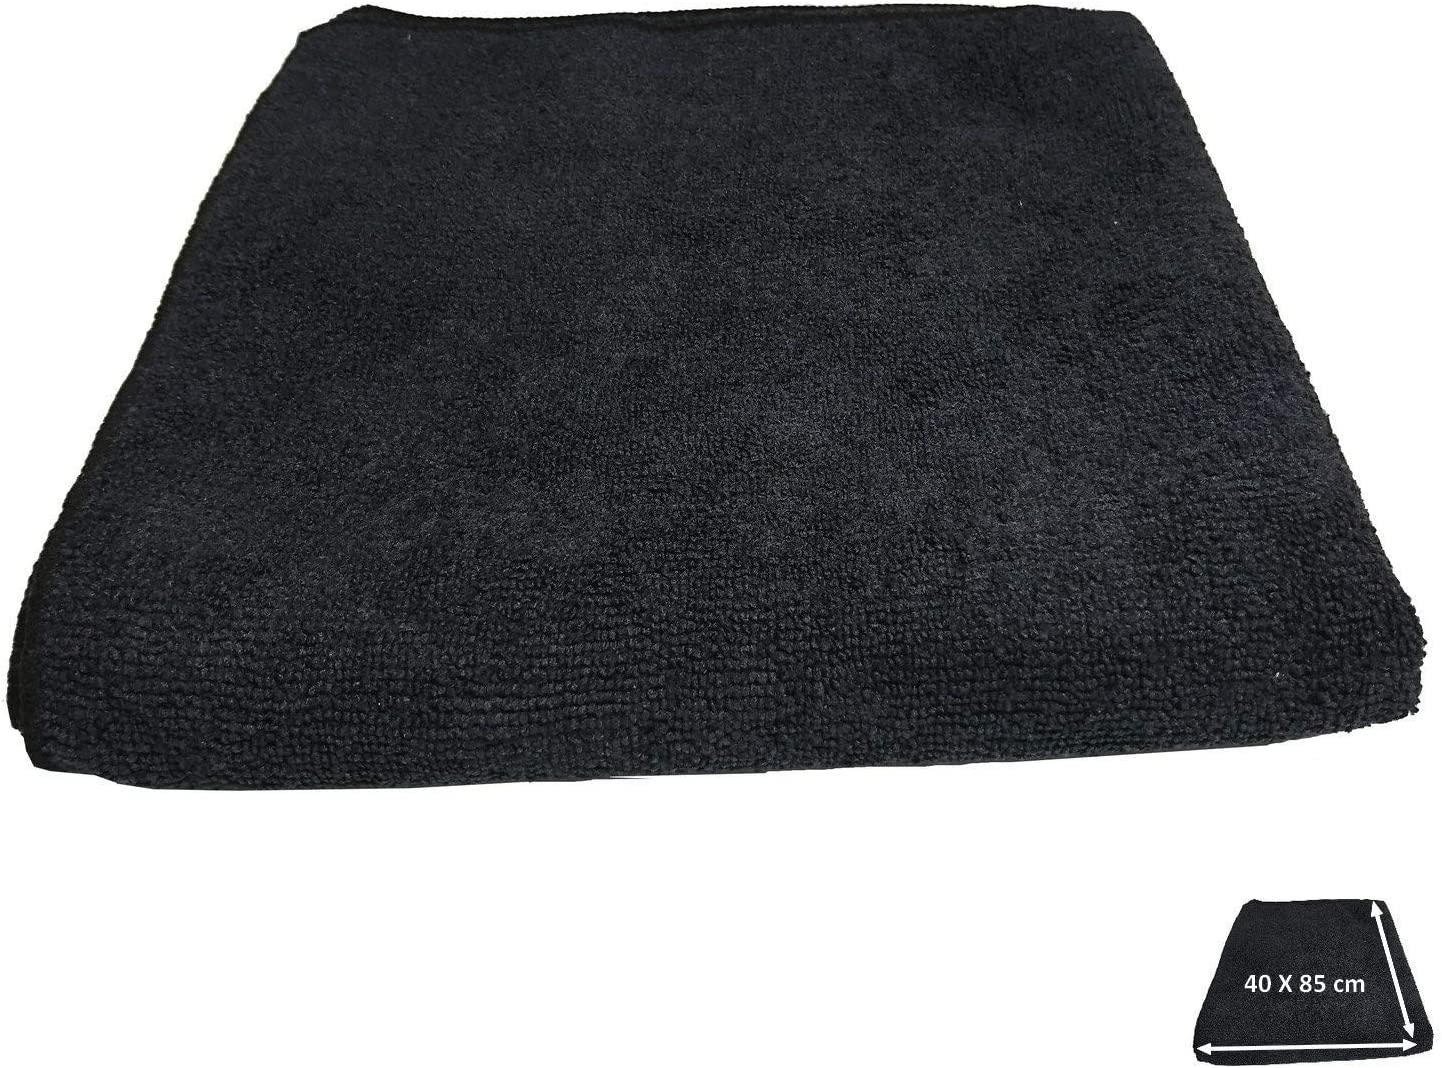 LAV RENOVAUTO 2 SERPILLIERES Maxi 40 X 85 cm Noire